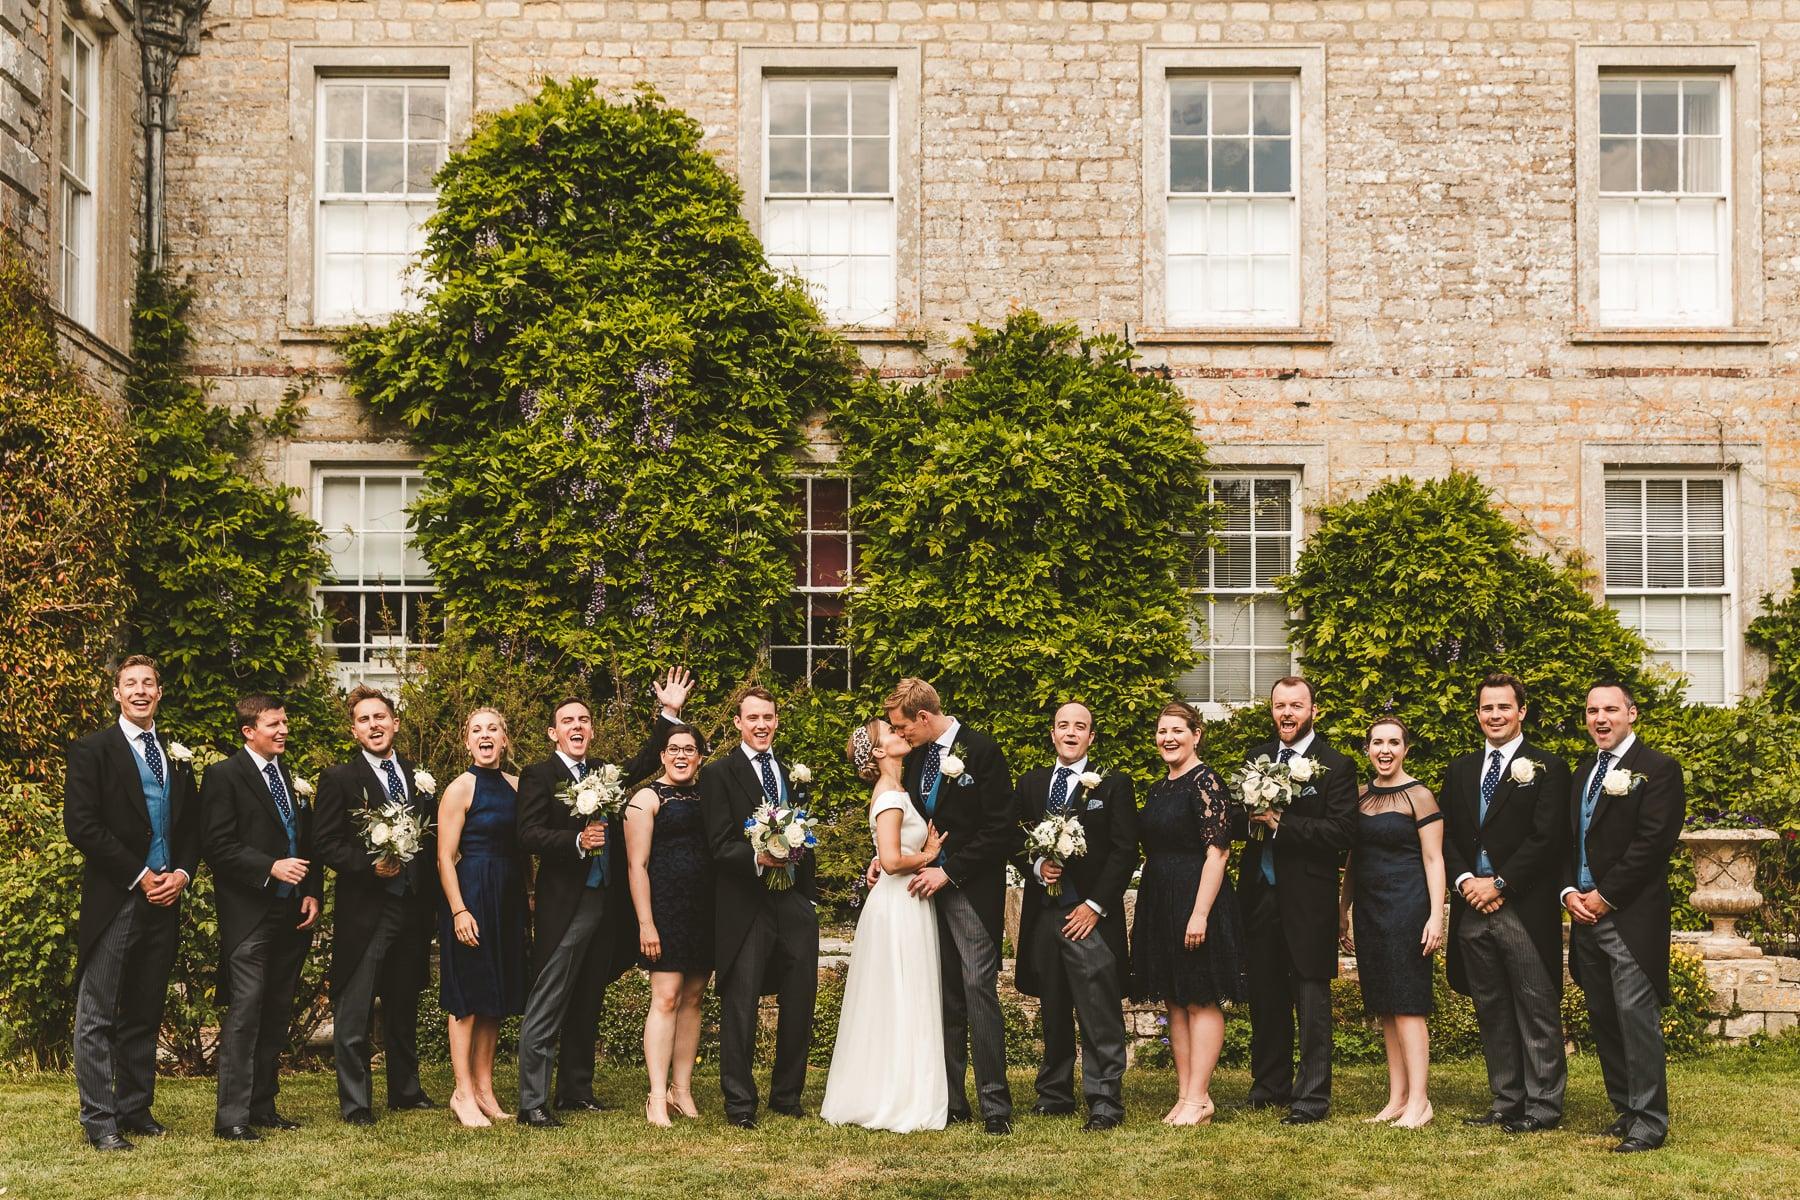 Wedding group photo Smedmore House gardens